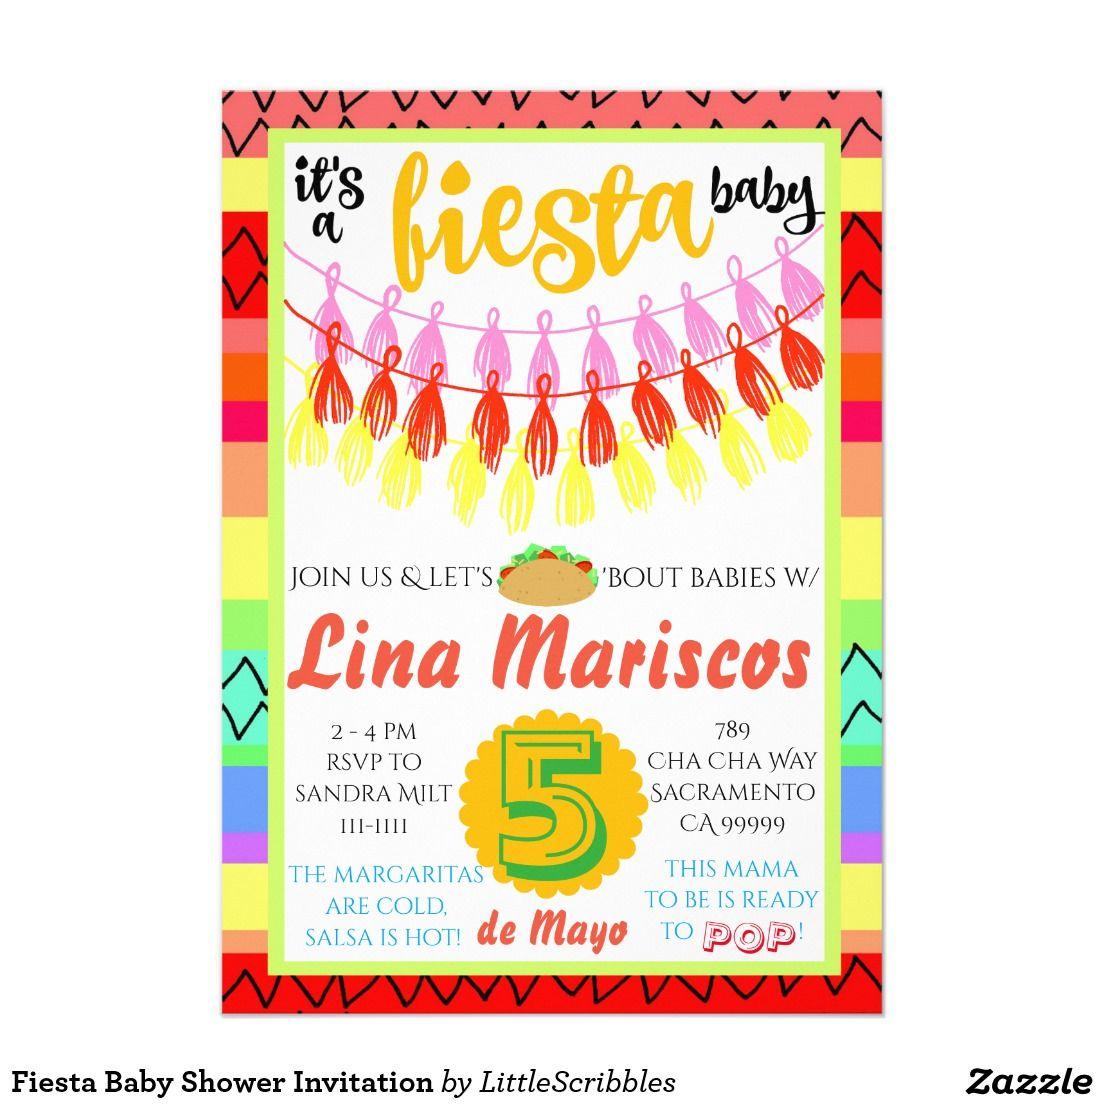 Fiesta Baby Shower Invitation, baby shower invitation, fiesta baby ...